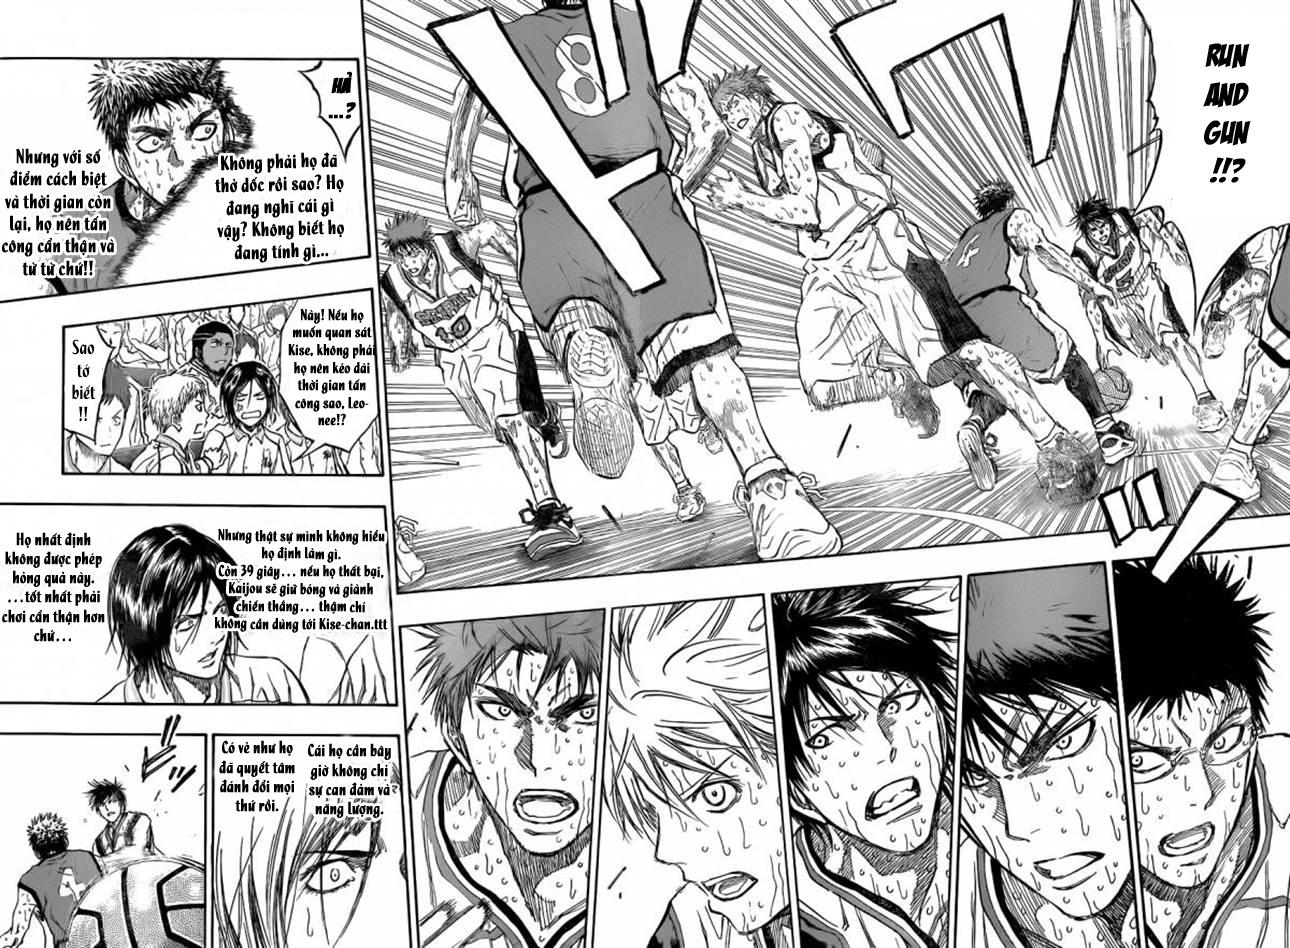 Kuroko No Basket chapter 200 trang 8